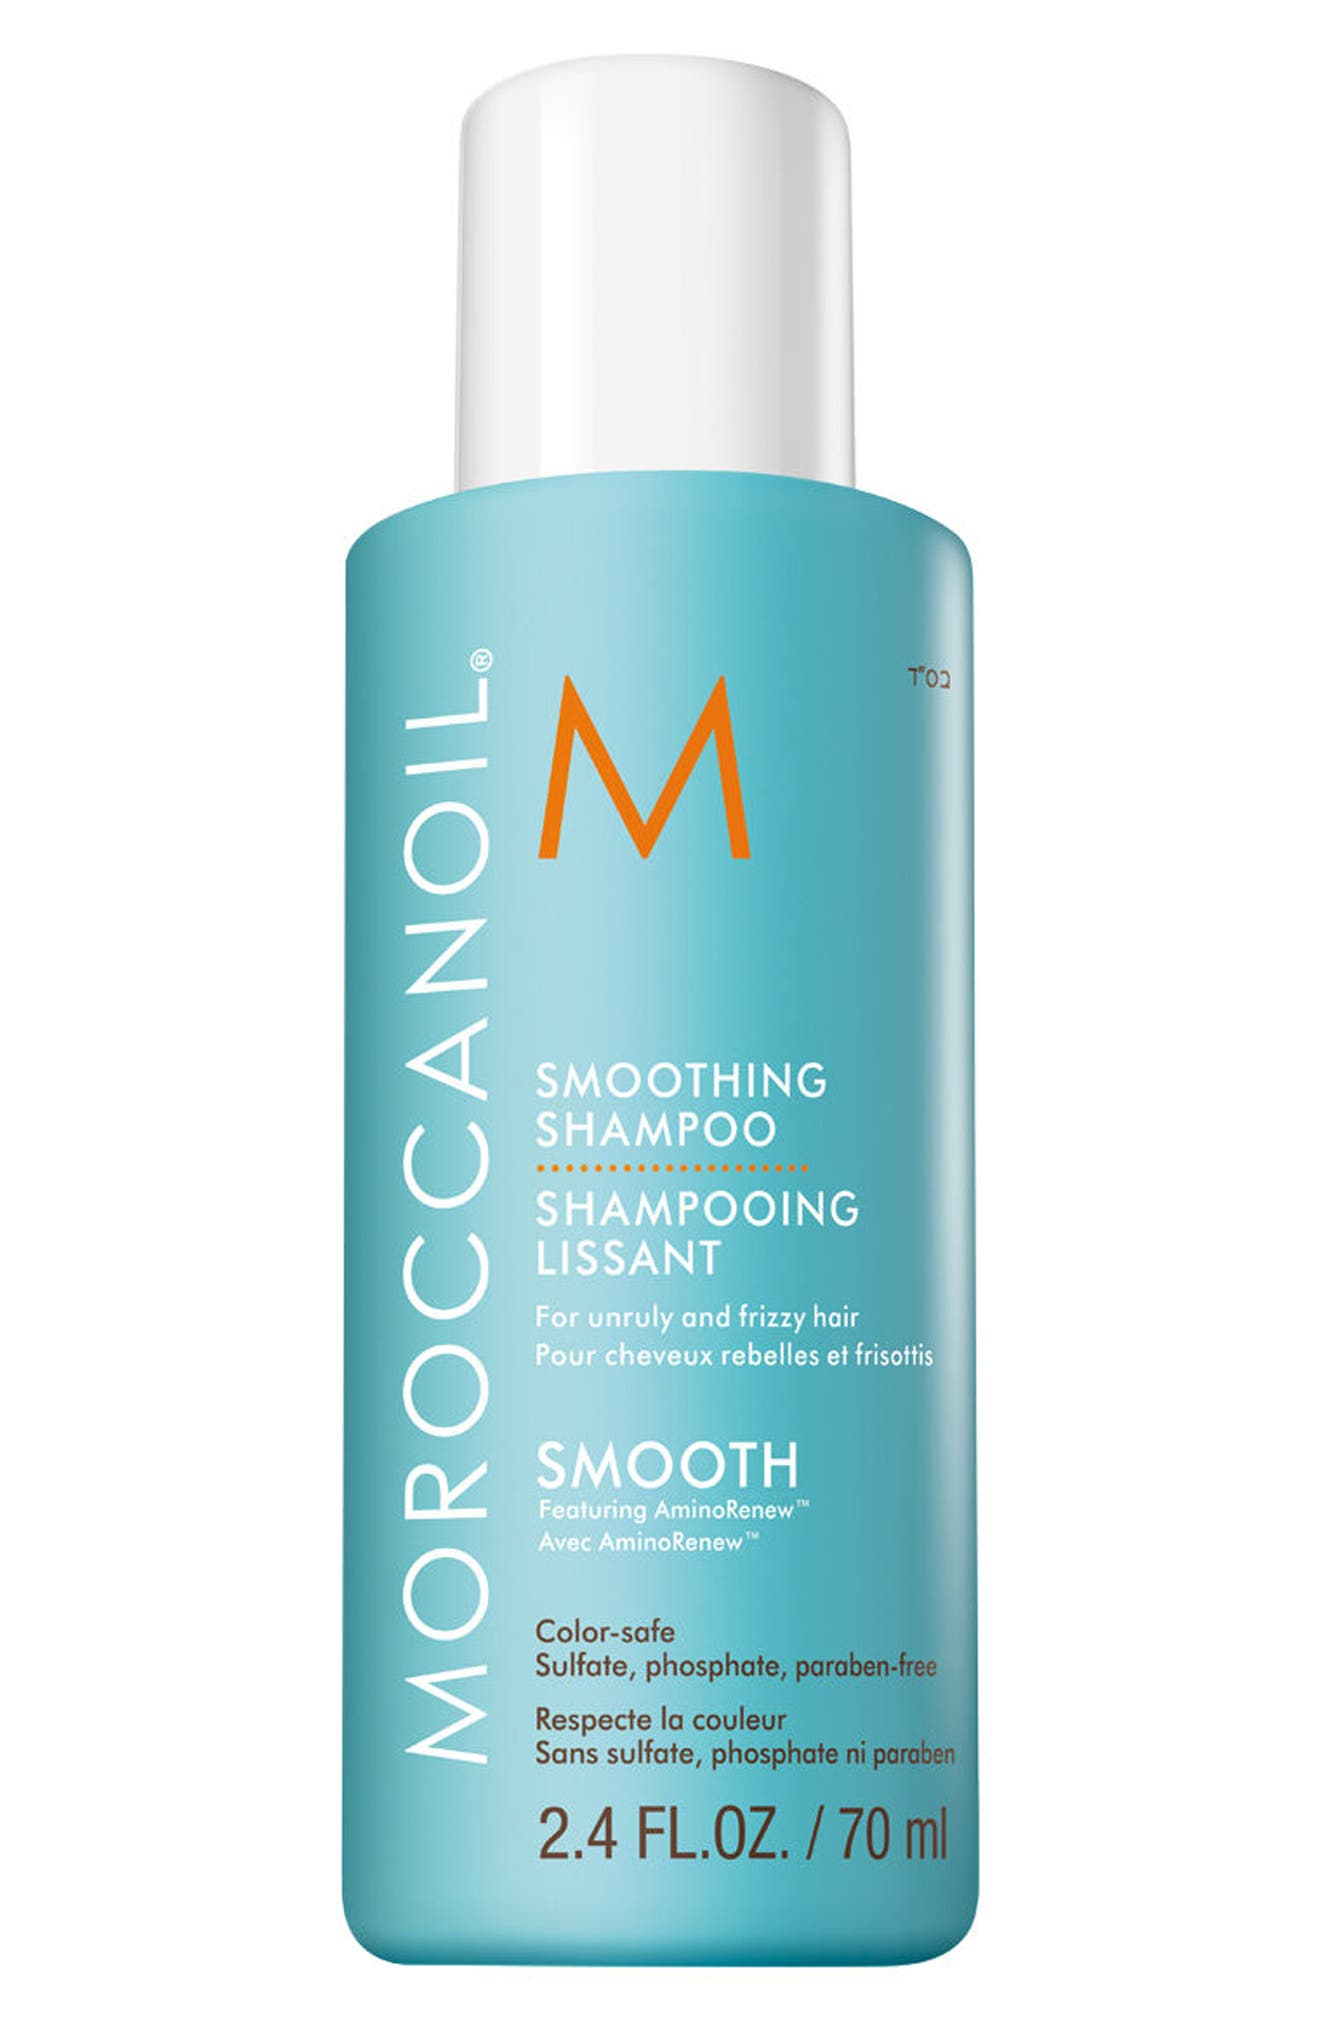 MOROCCANOIL® Travel Size Smoothing Shampoo